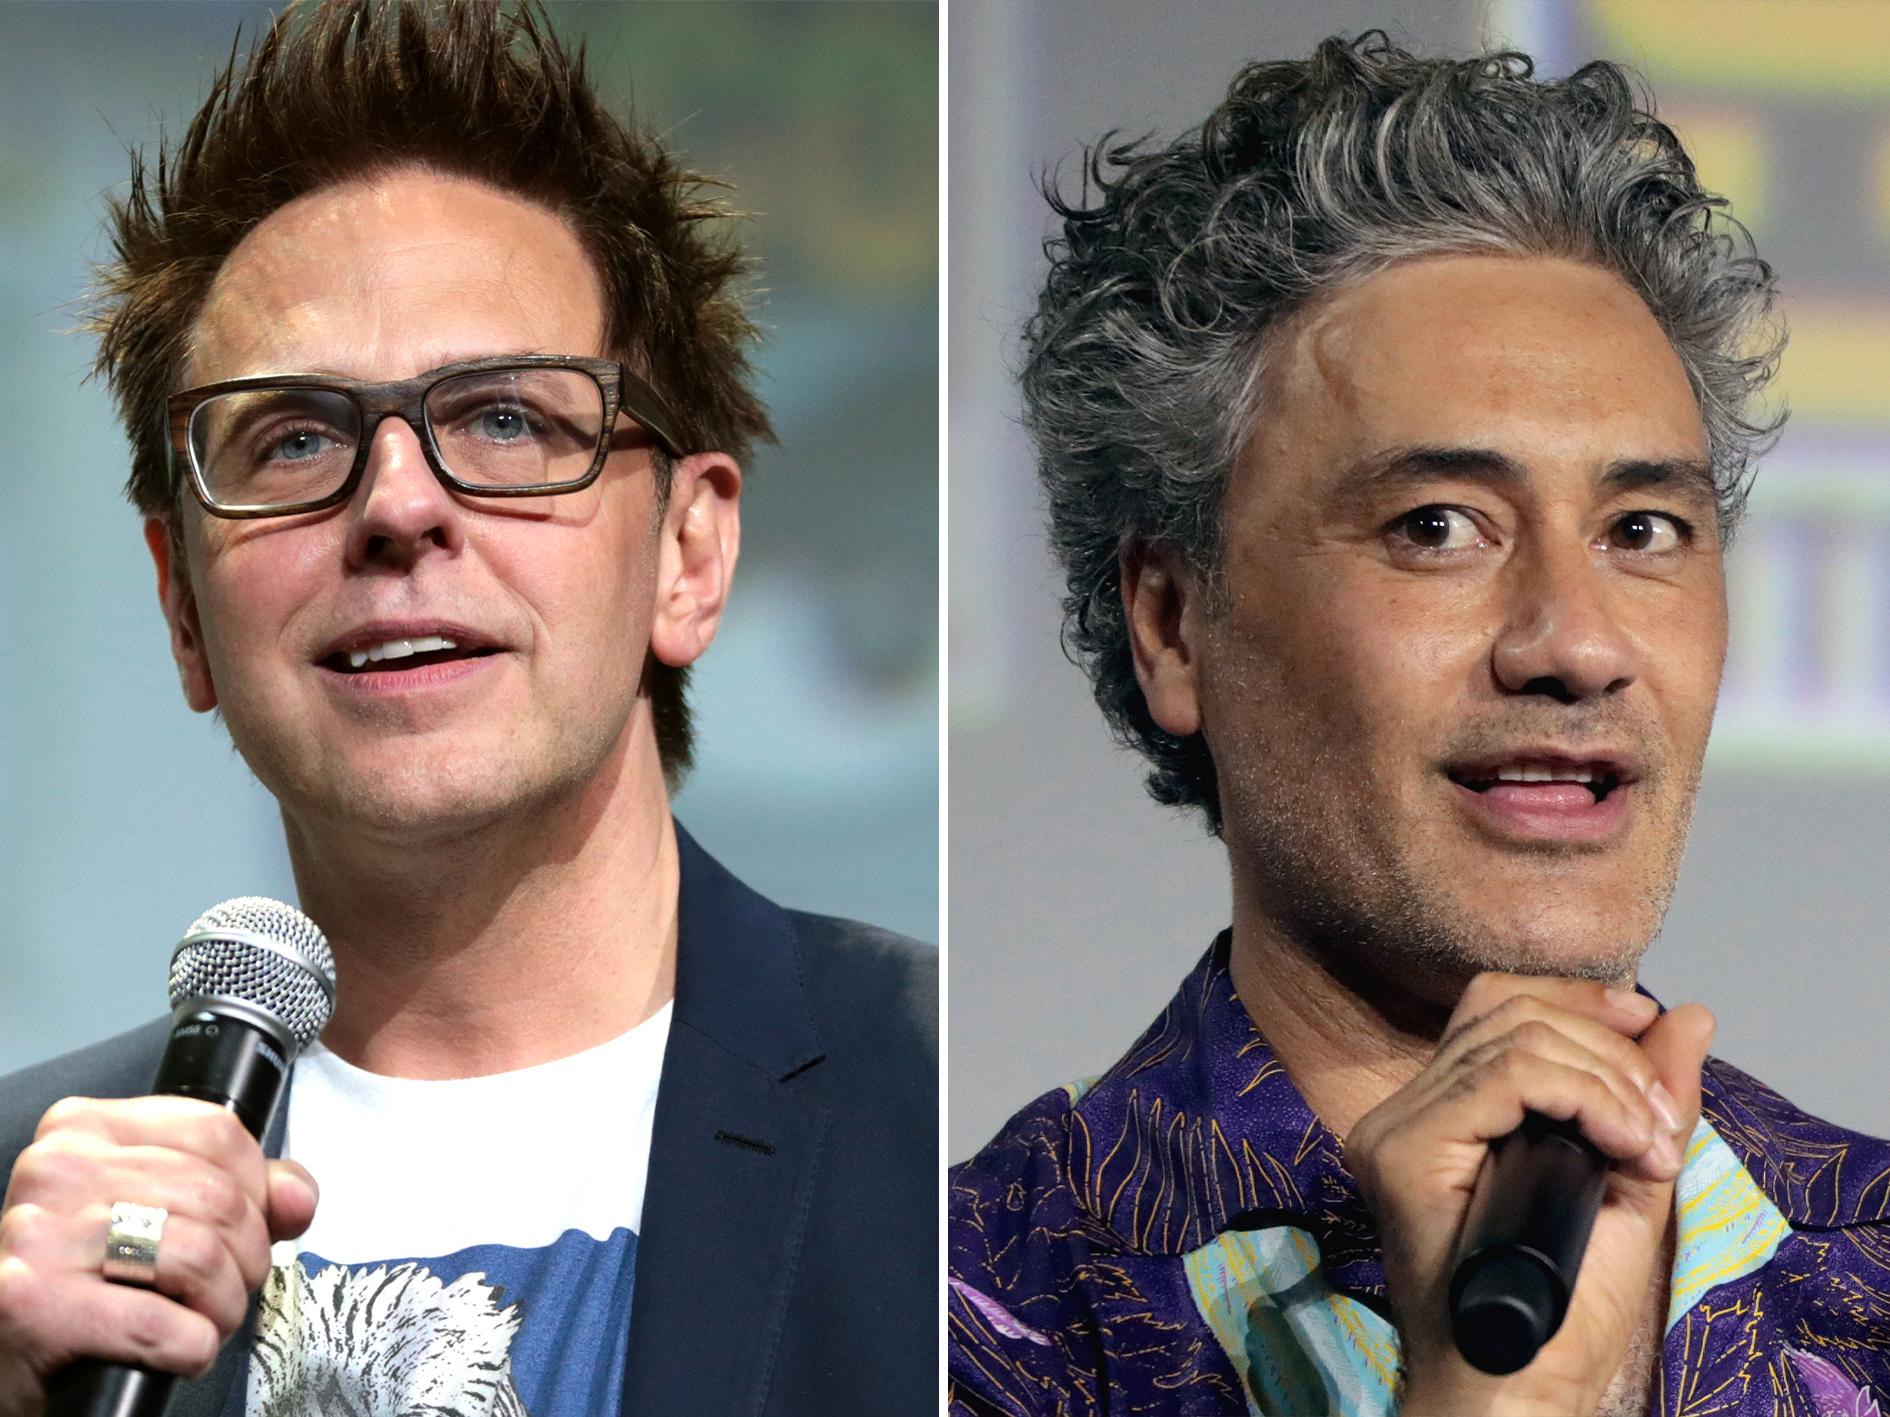 James Gunn Taika Waititi 25 Things You Didn't Know About Avengers: Endgame